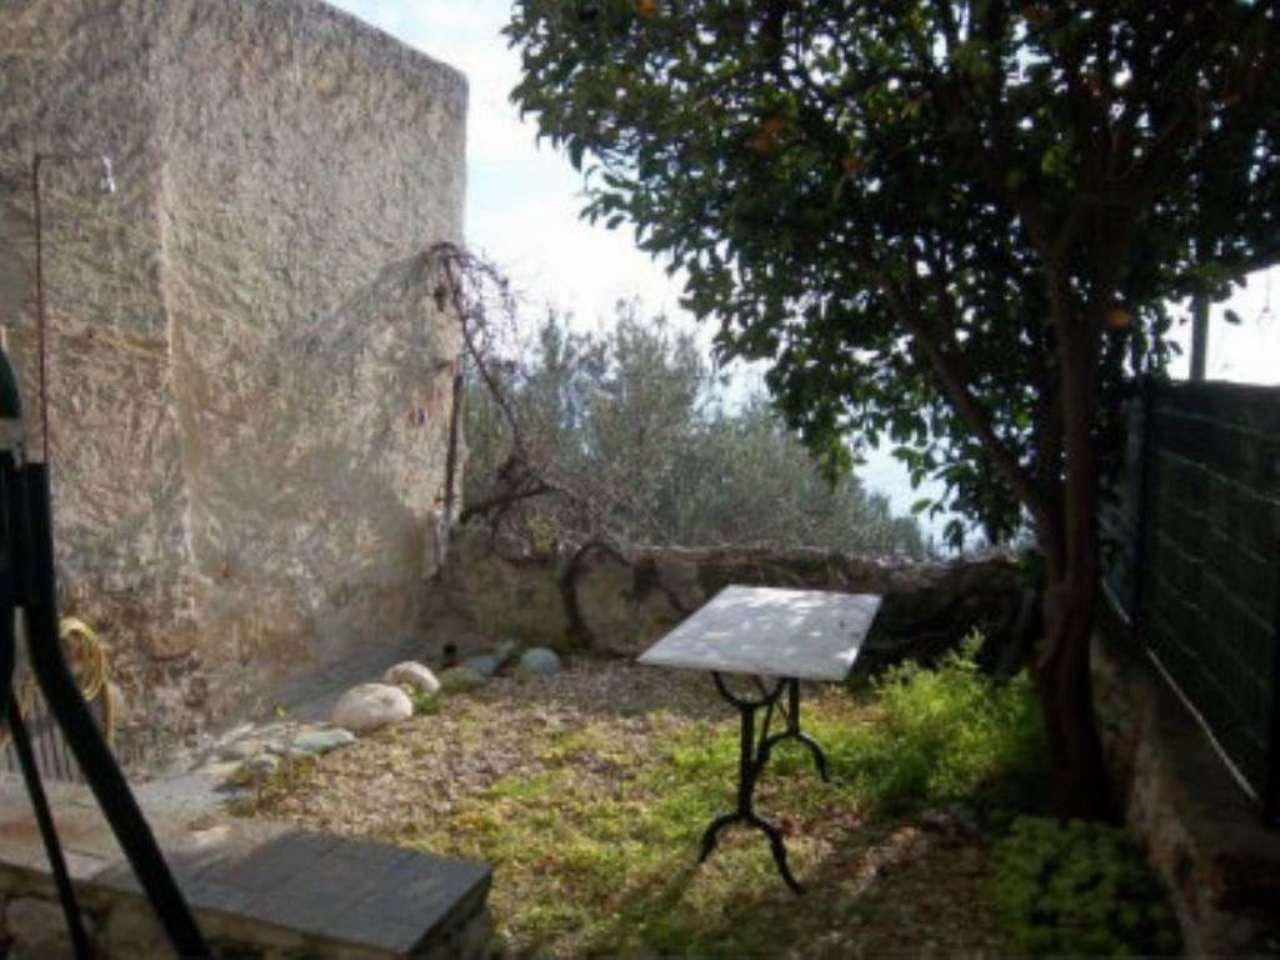 Bilocale Finale Ligure Via Regione Giardino 5